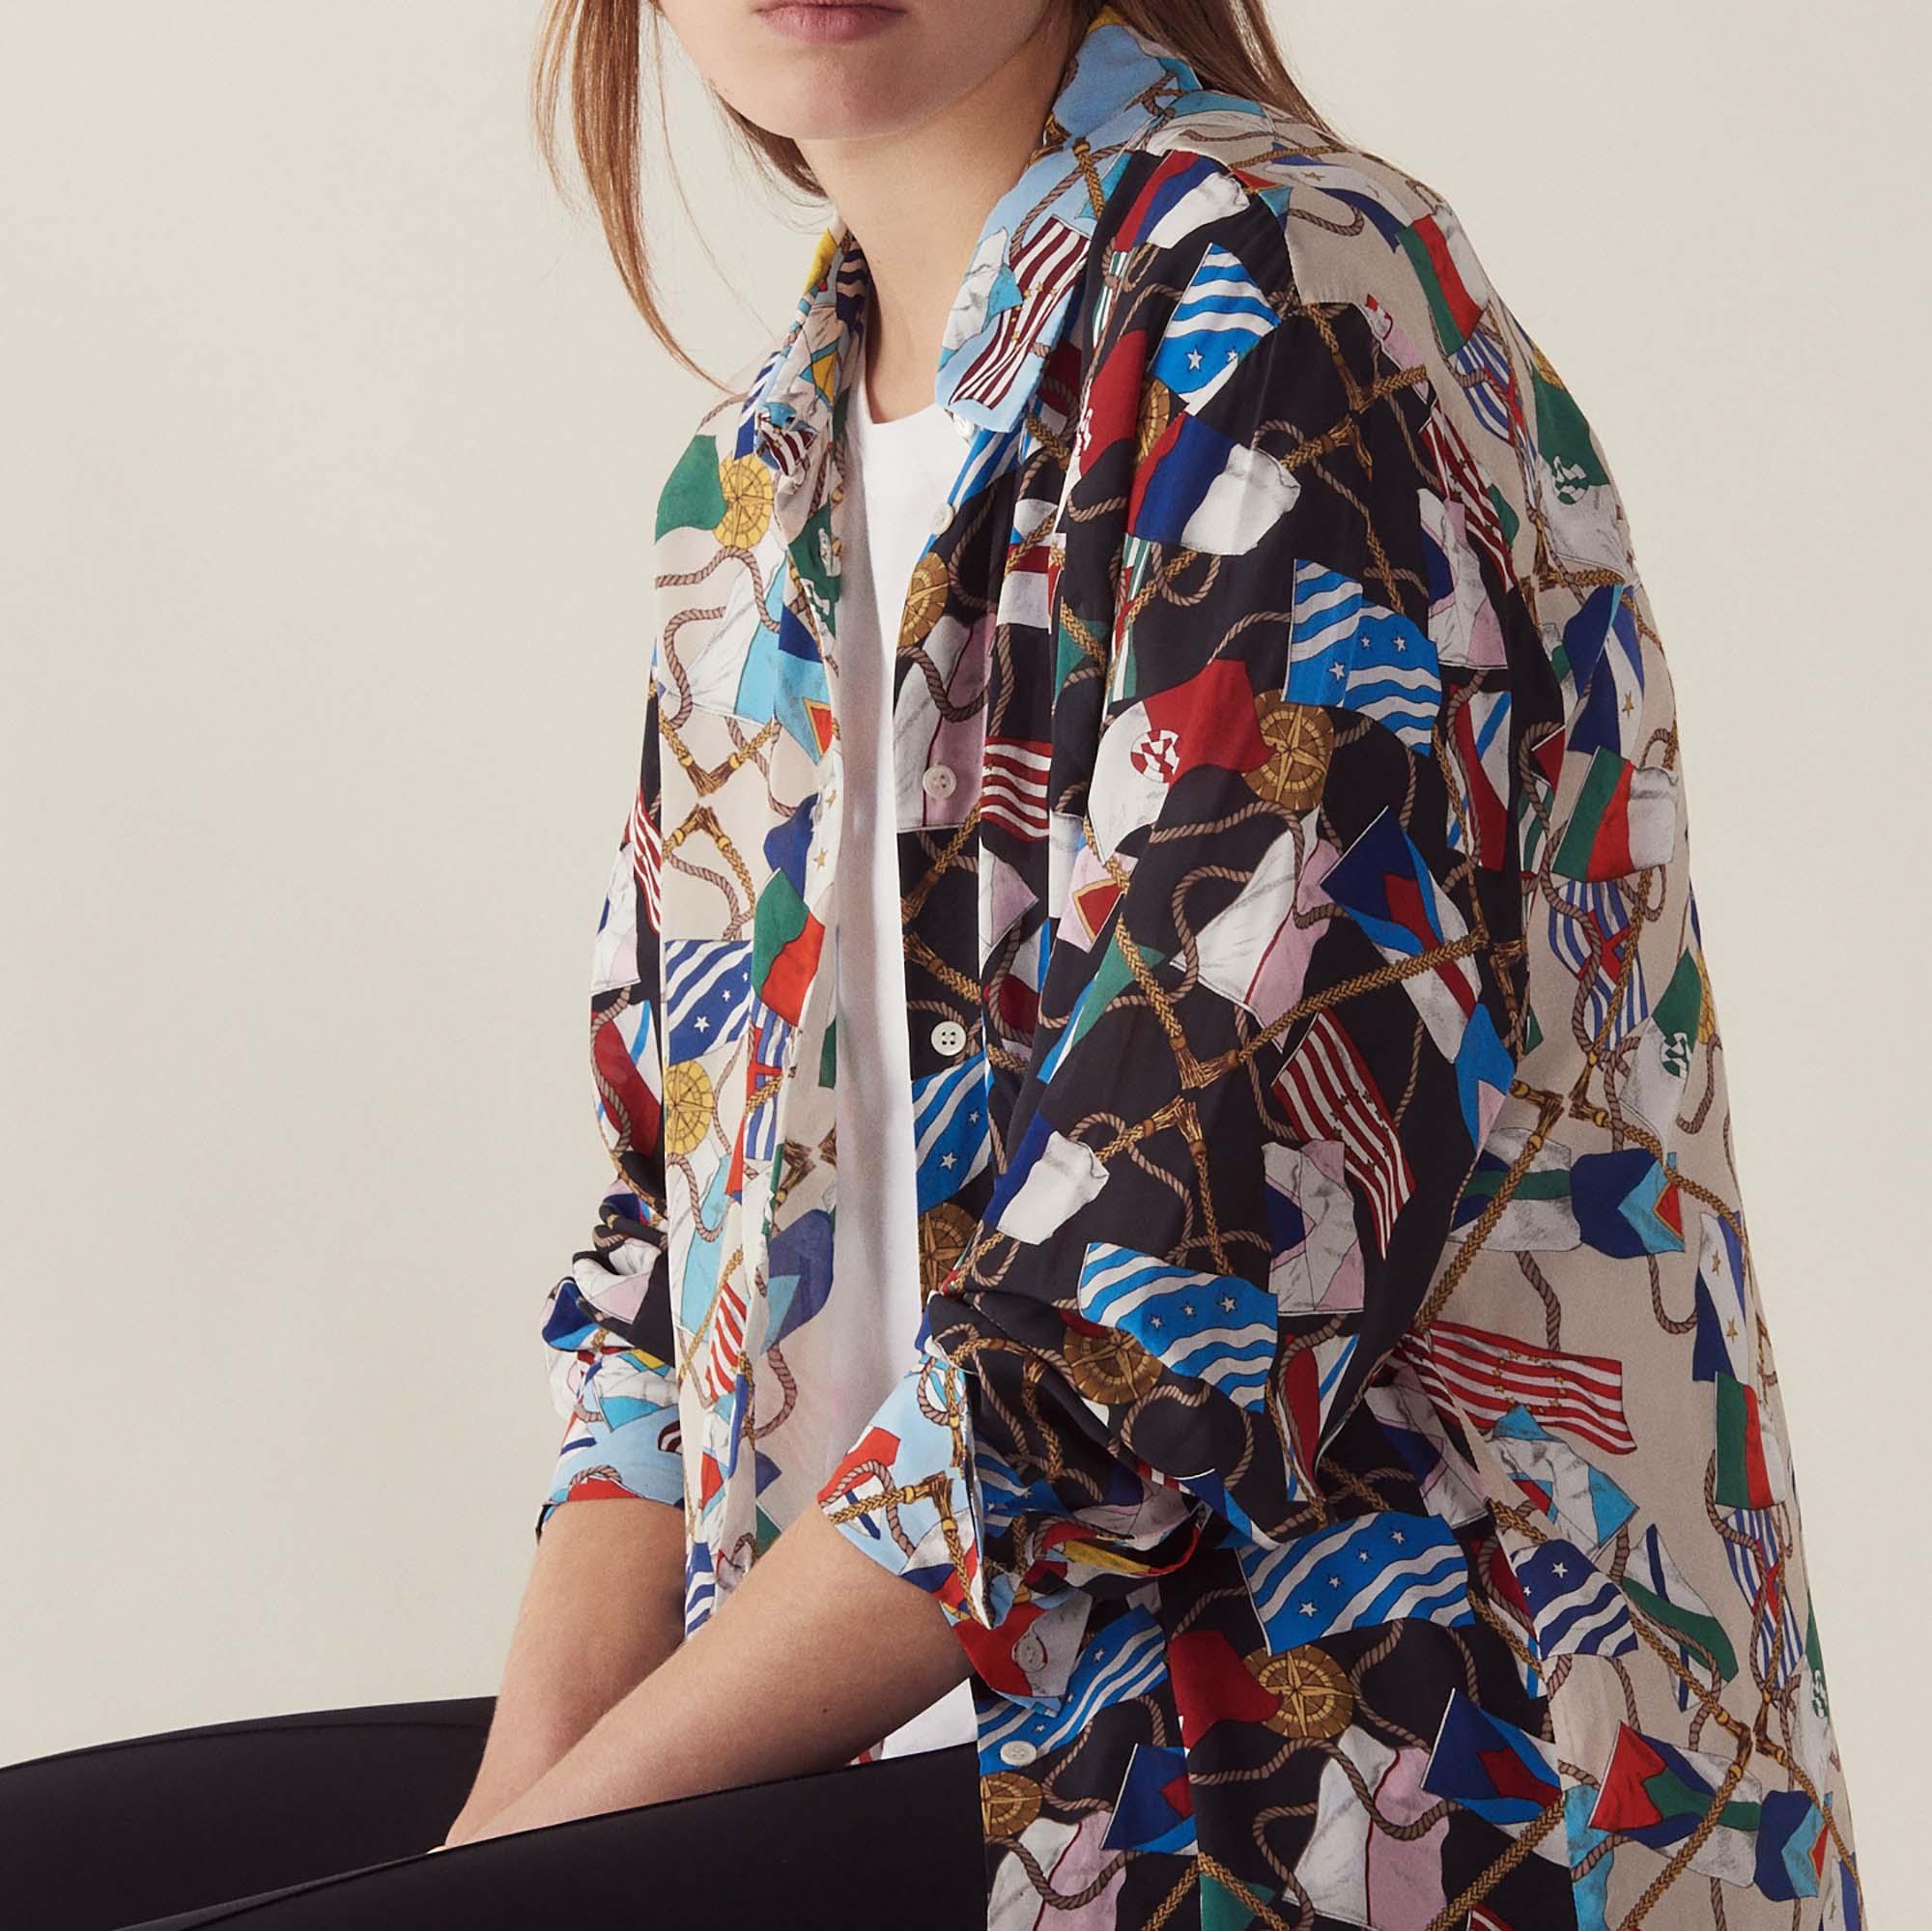 All Over Flag Print Shirt Tops Shirts Sandro Paris